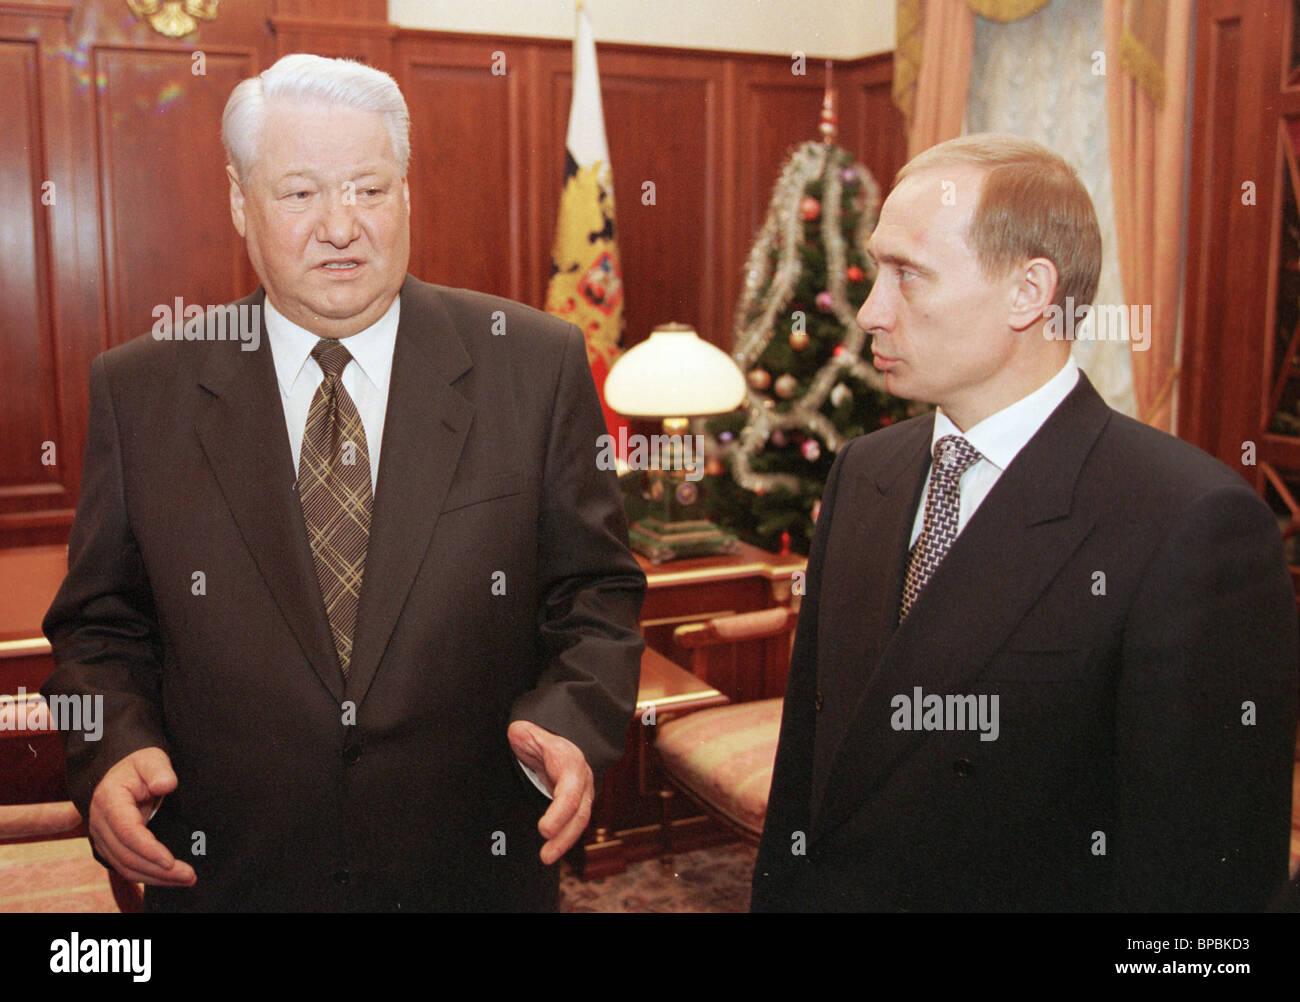 Yeltsin meets Putin in the Kremlin - Stock Image